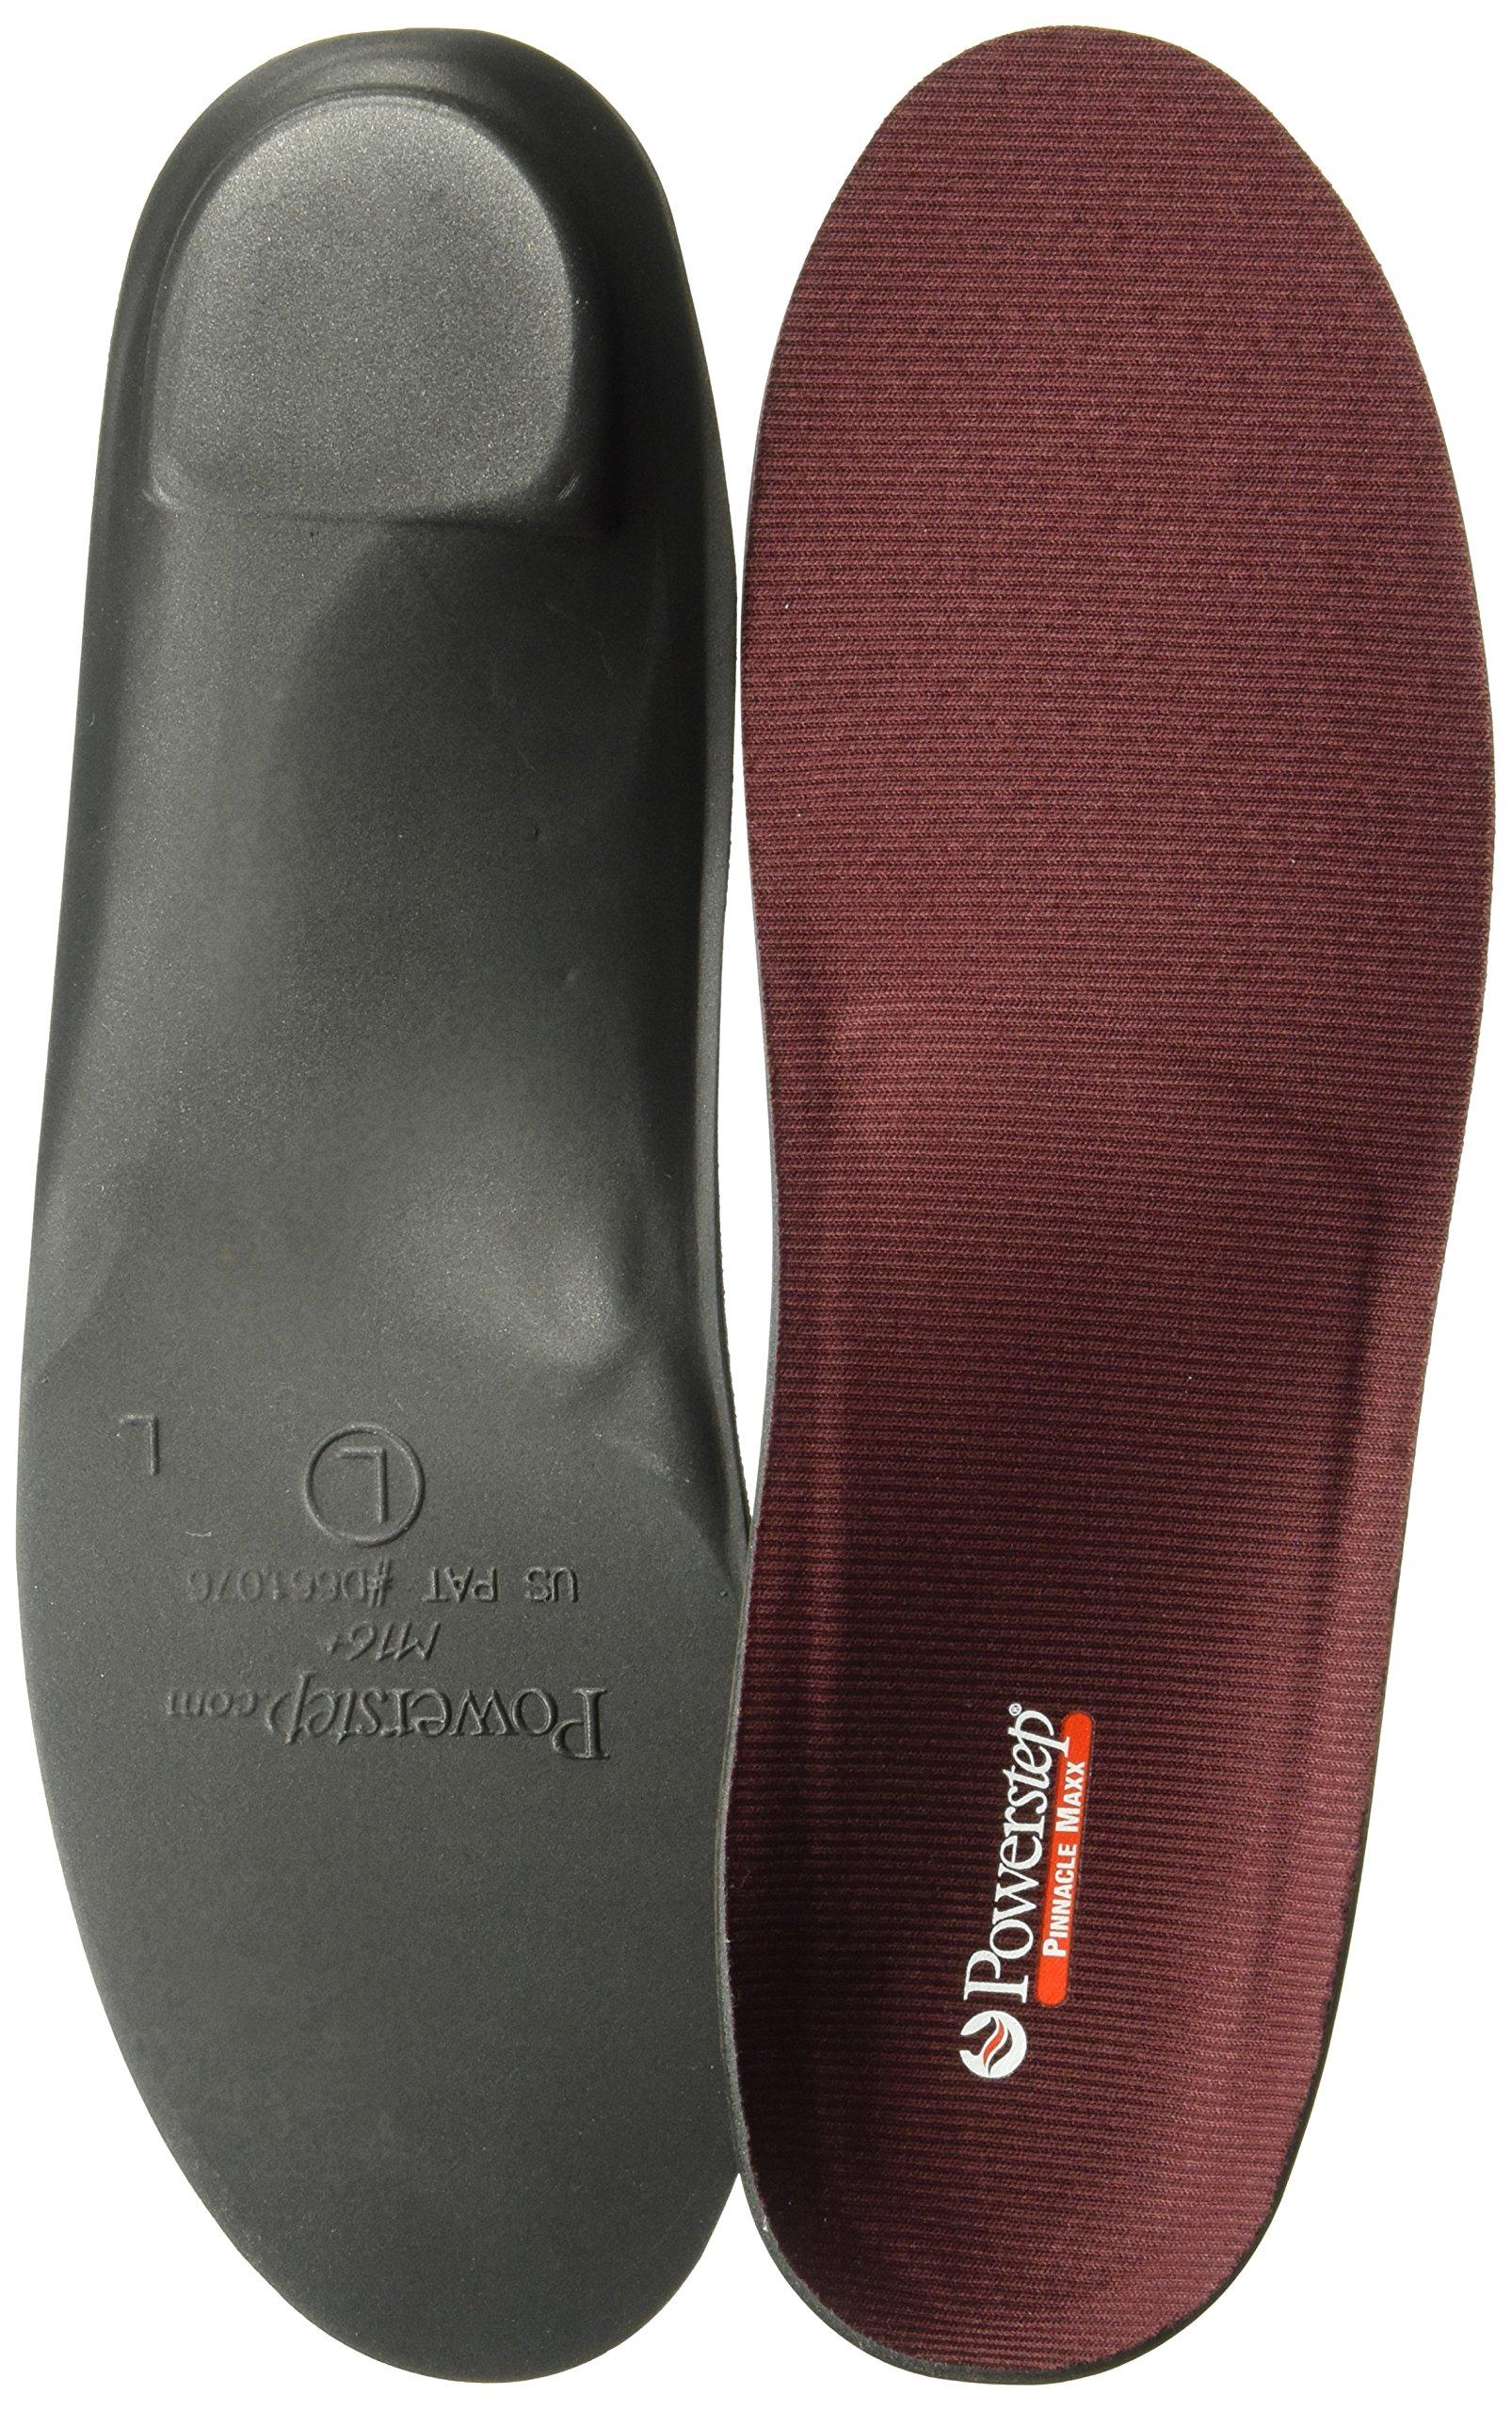 Powerstep Pinnacle Maxx Full Length Orthotic Shoe Insoles, Maroon/Black, Men's 10-10.5/Women's 12 M US